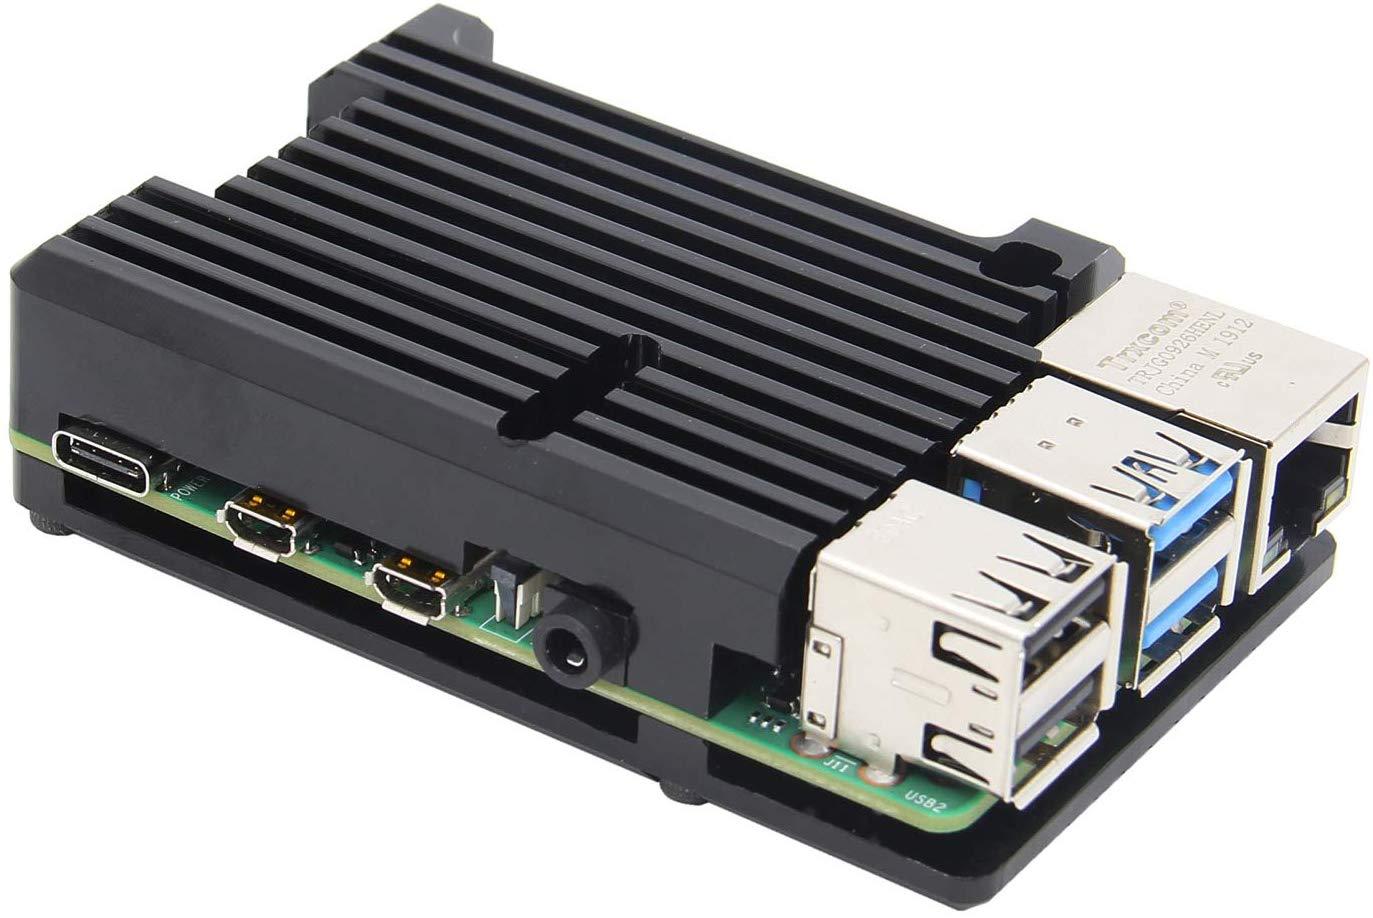 Raspberry Pi 4 Model B with heatsink case